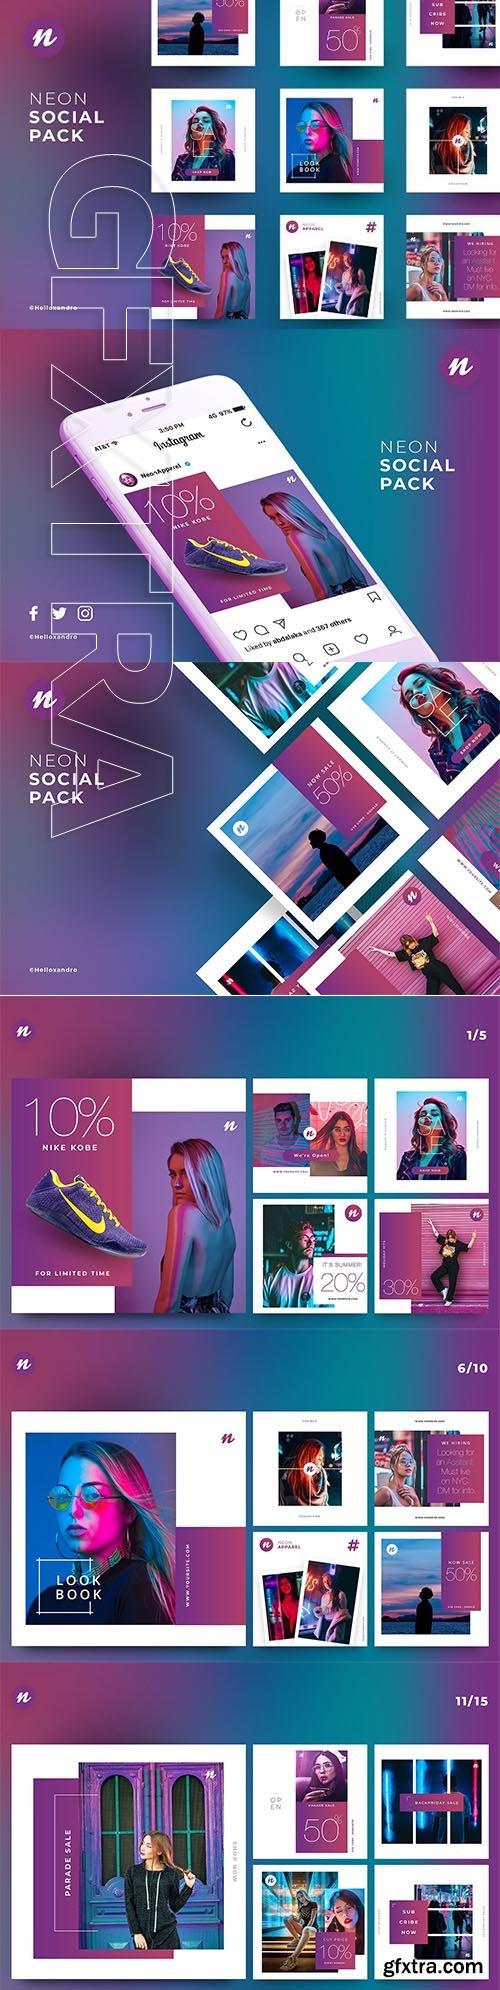 CreativeMarket - Neon - Social Pack 2845743